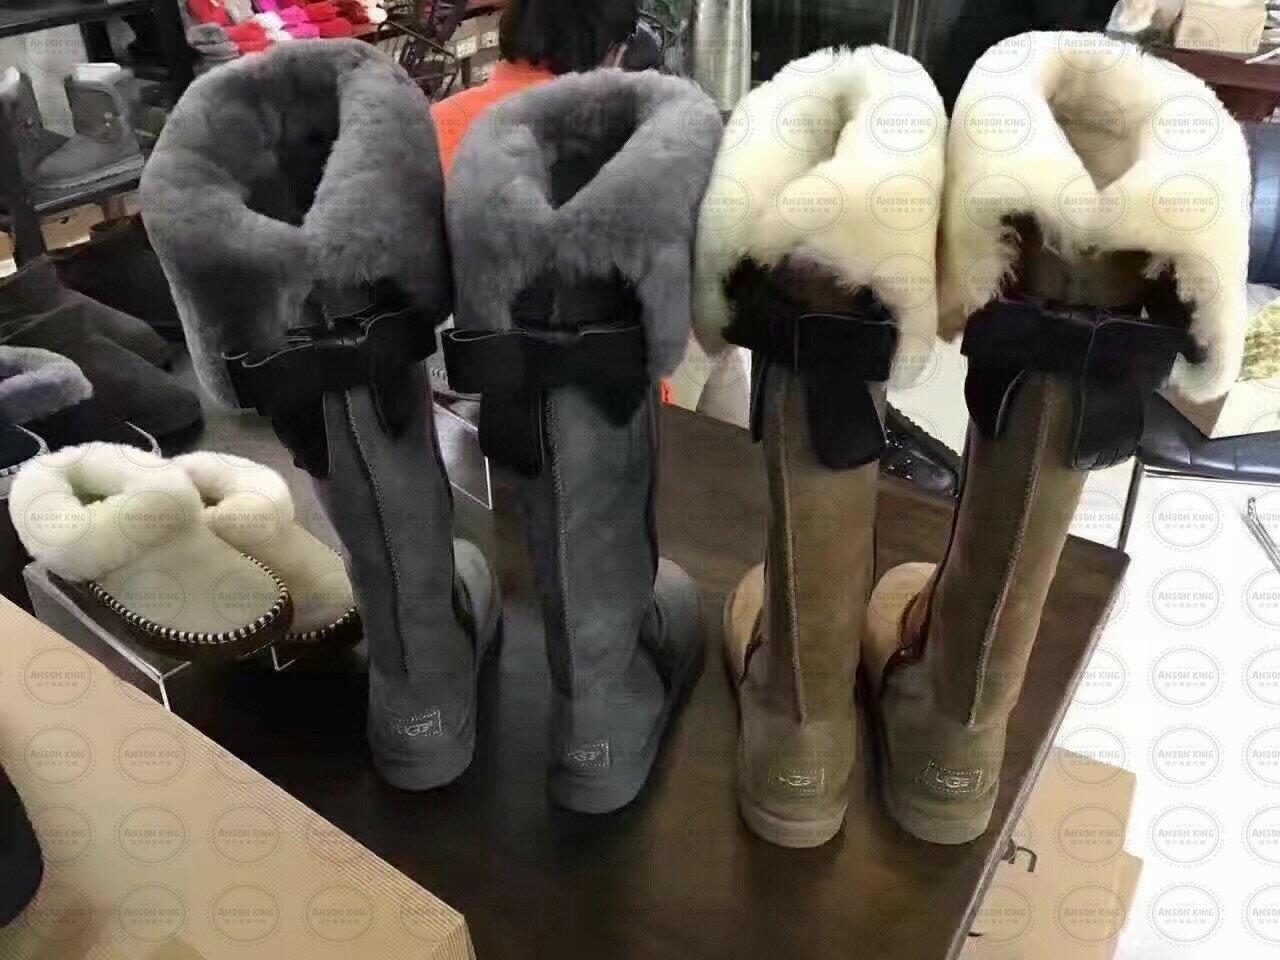 OUTLET正品代購 澳洲 UGG 千頌伊同款過膝羊皮毛雪靴 保暖 真皮羊皮毛 雪靴 短靴 灰色 4